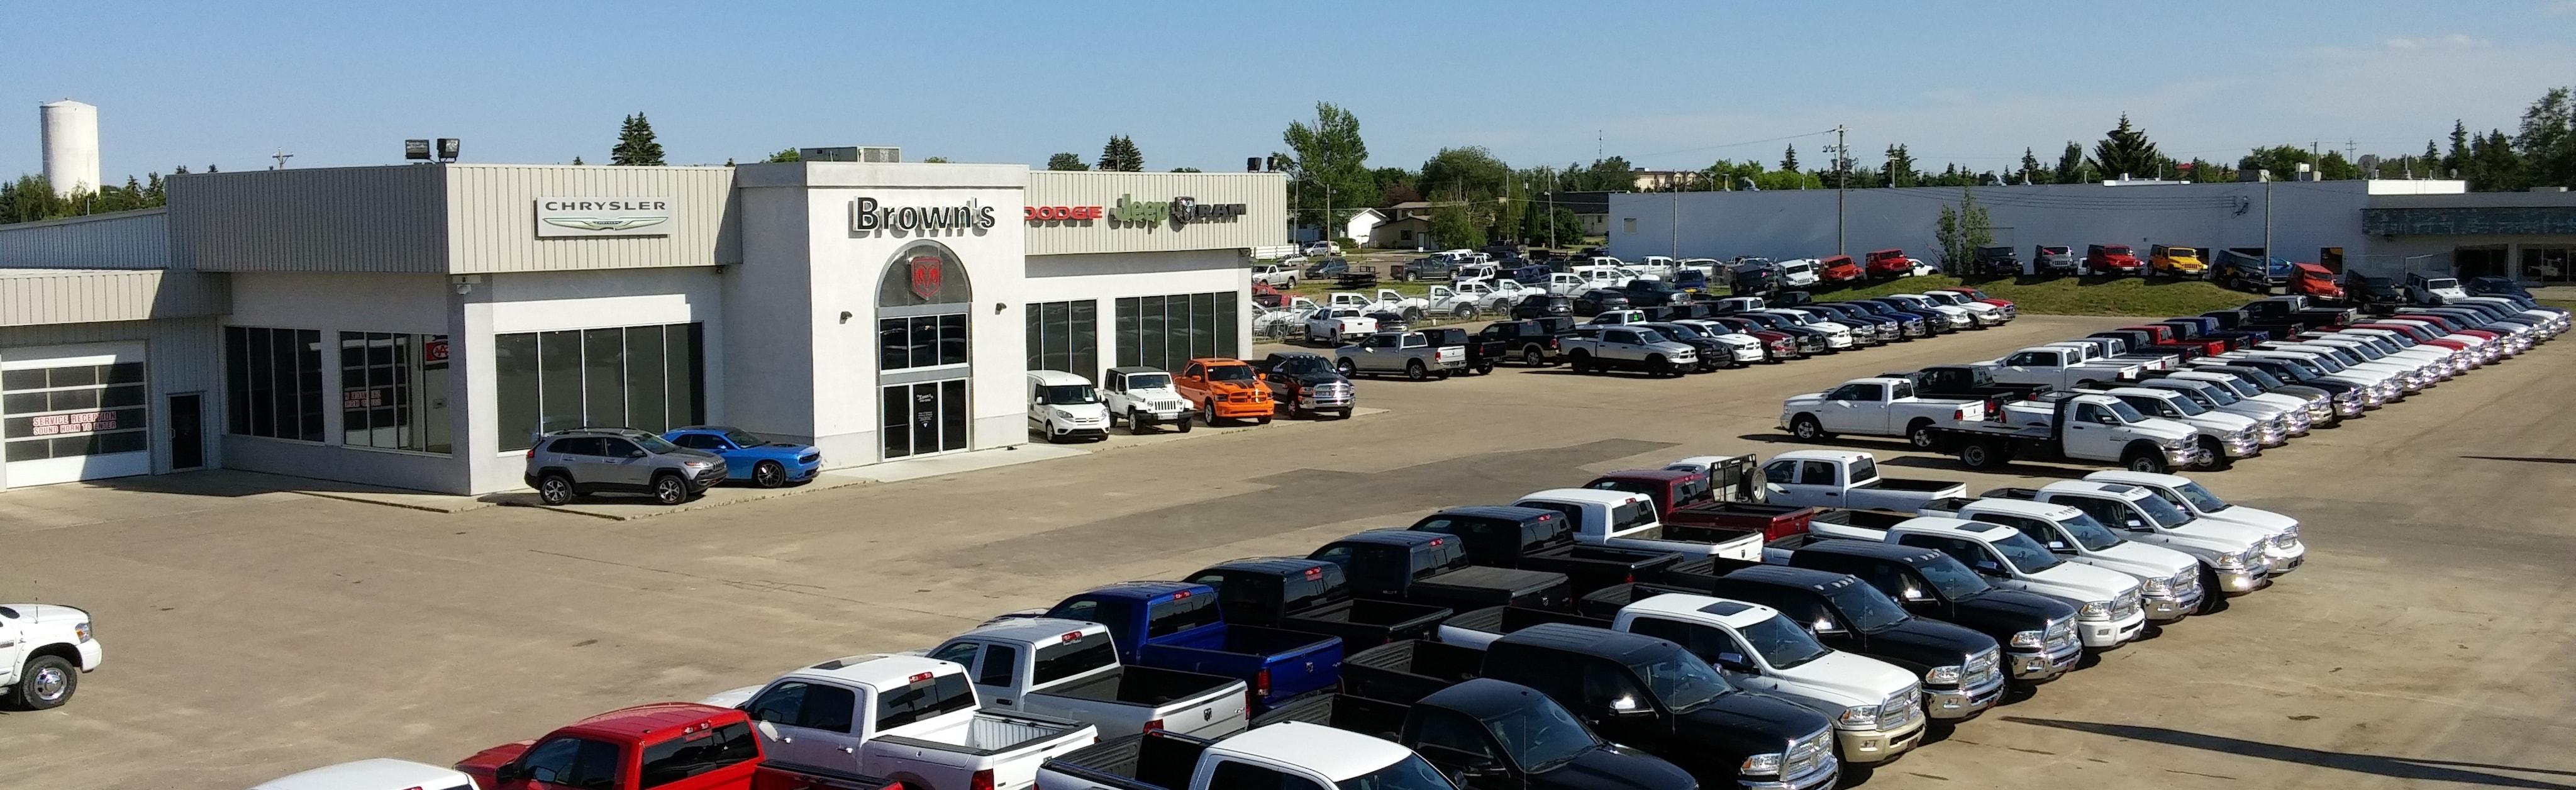 and bay dealers dodge chrysler me appleton kolosso dealer used ram jeep near new wisconsin dealership in green